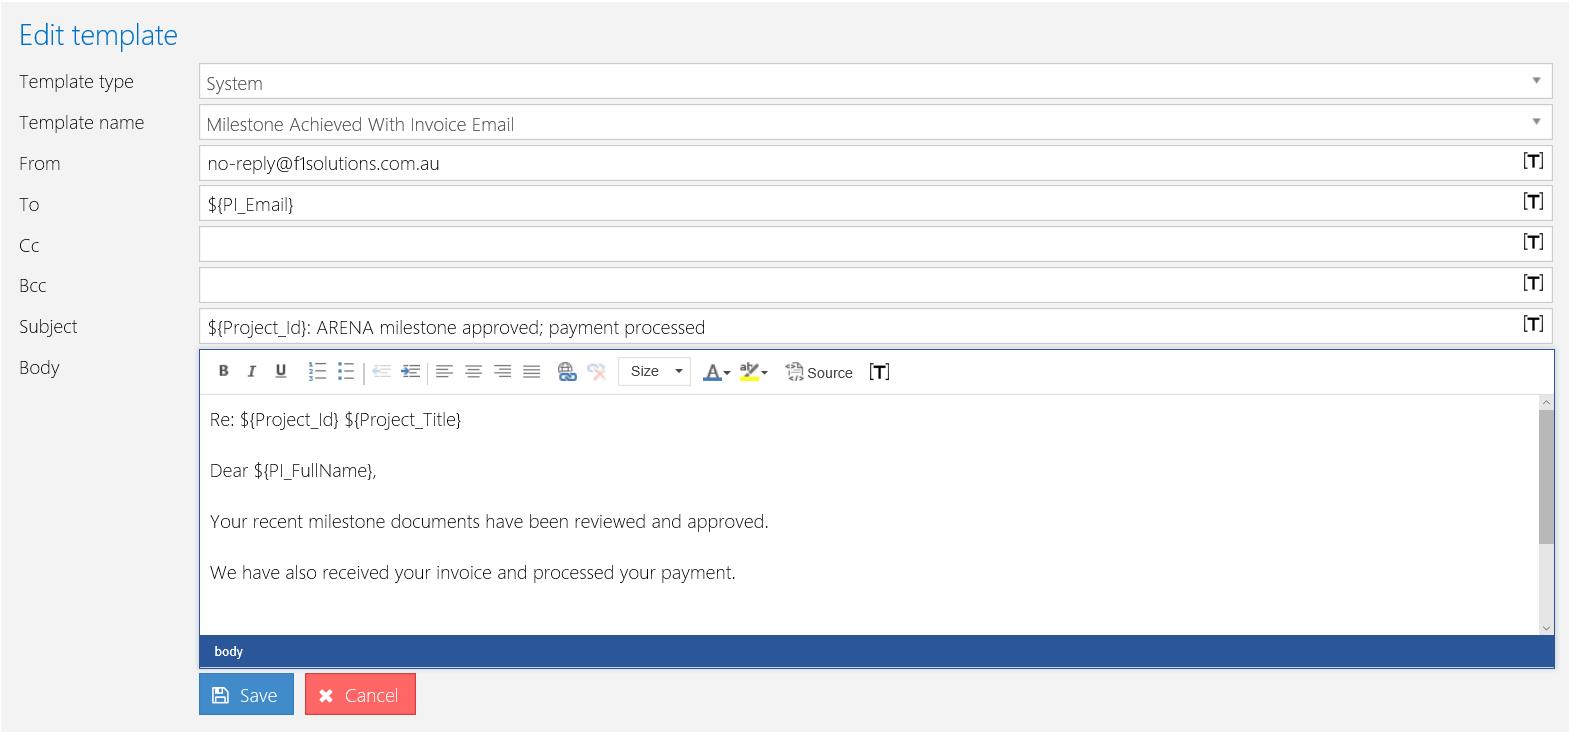 Milestone Achieved With Invoice Email Omnistar Wiki Omnistar Wiki